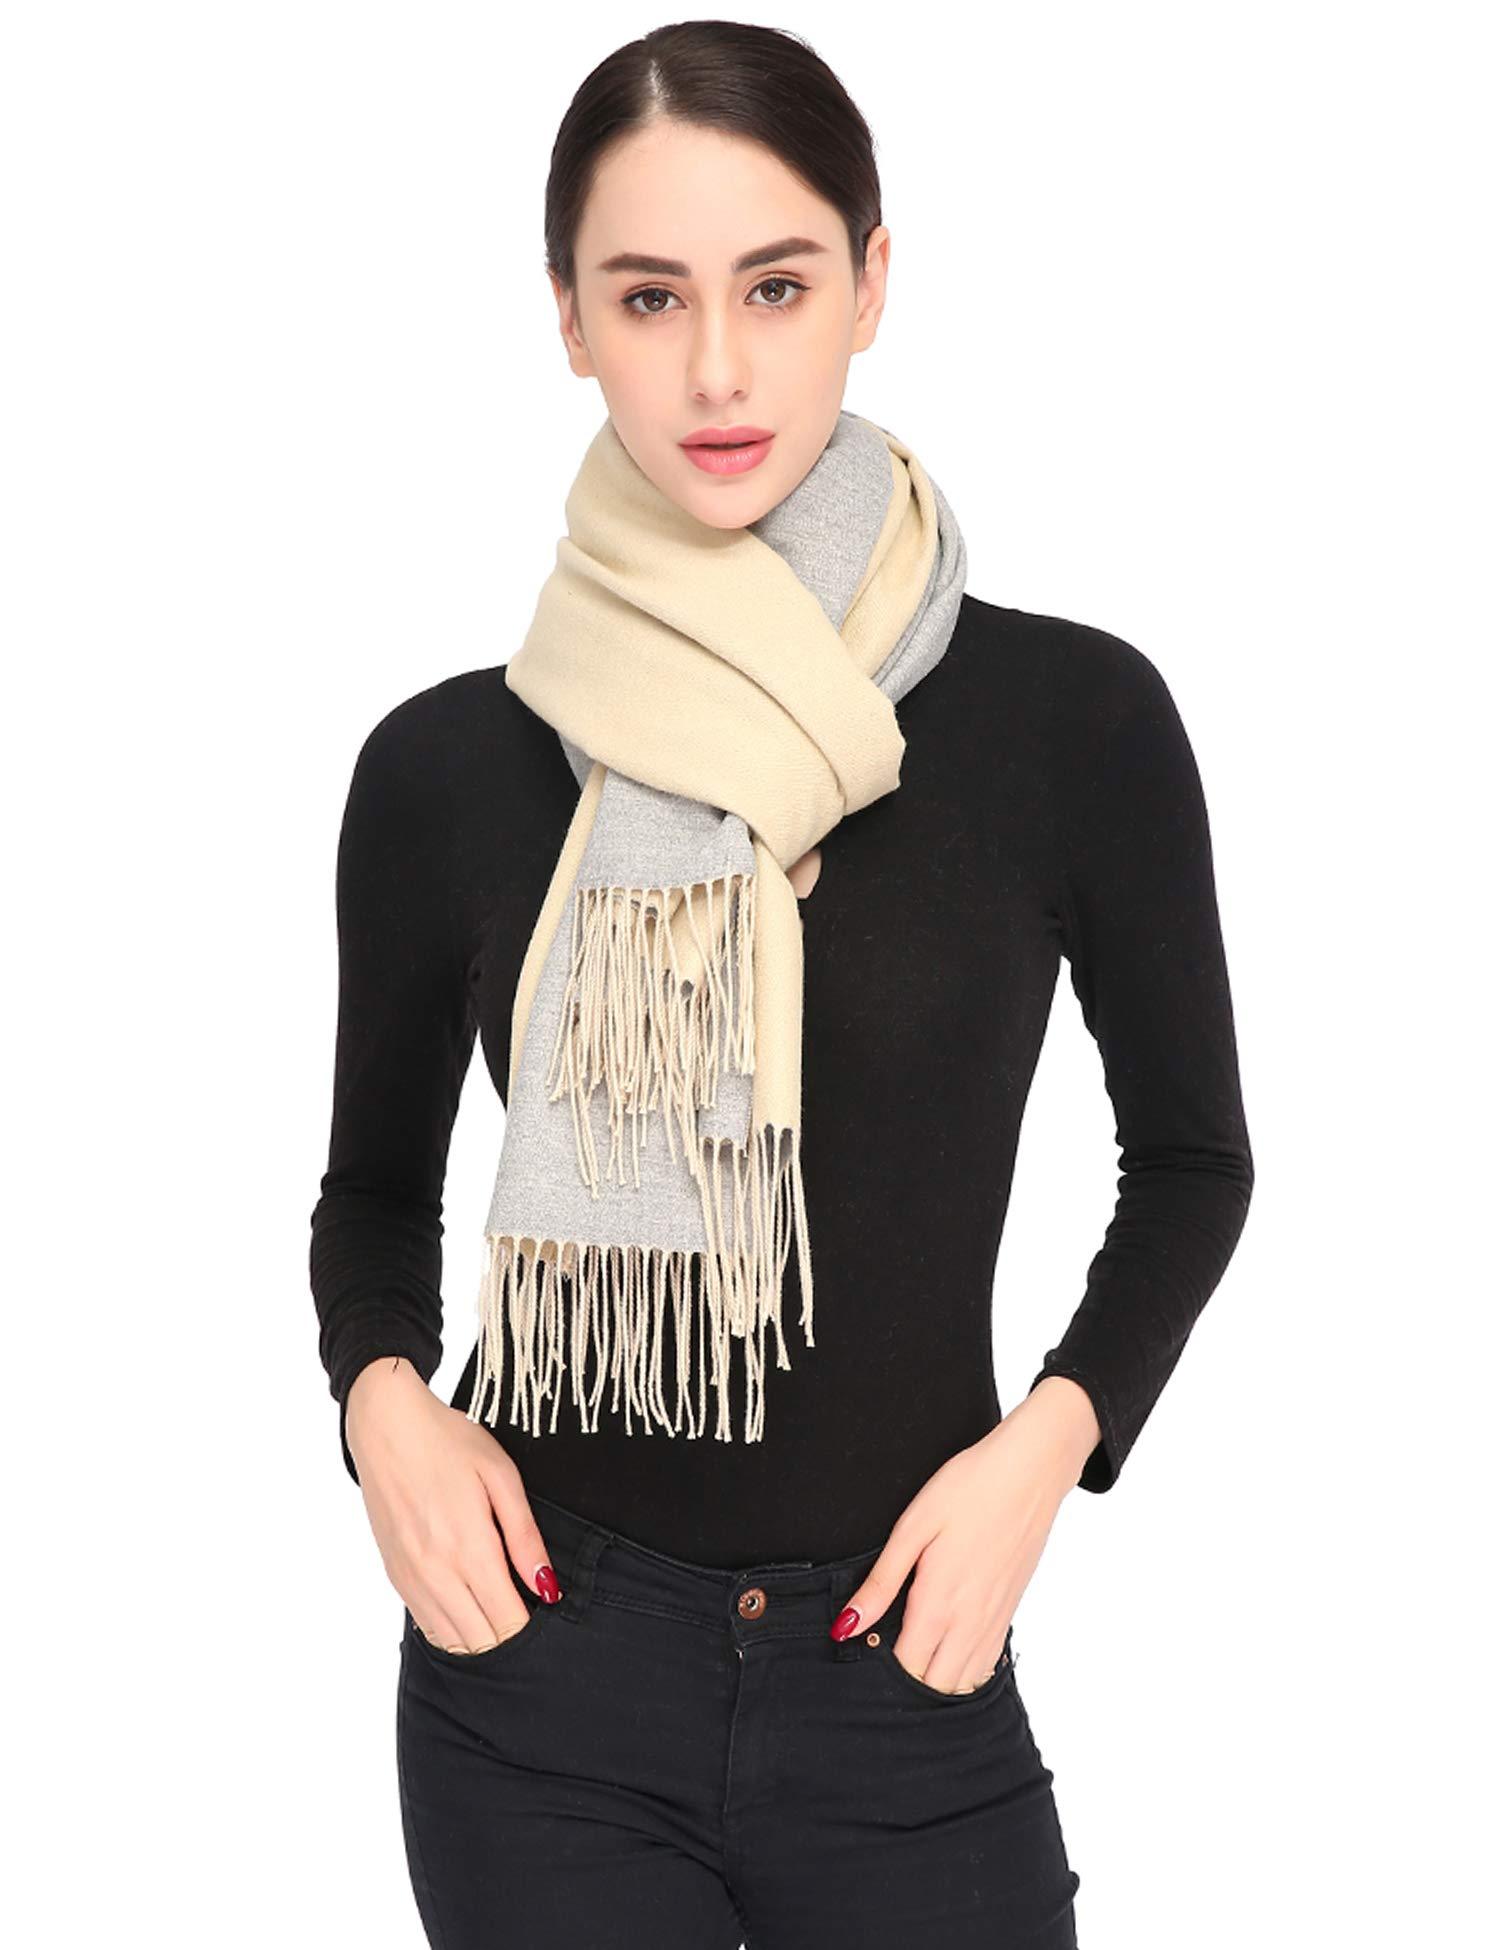 Luxuriously Soft Large Winter Scarves GIft Box Women Stylish Warm Blanket Scarf Solid Oversized Pashmina Cashmere Shawl Wrap Scarves 75''x25.5'' (Beige/Grey, Box)